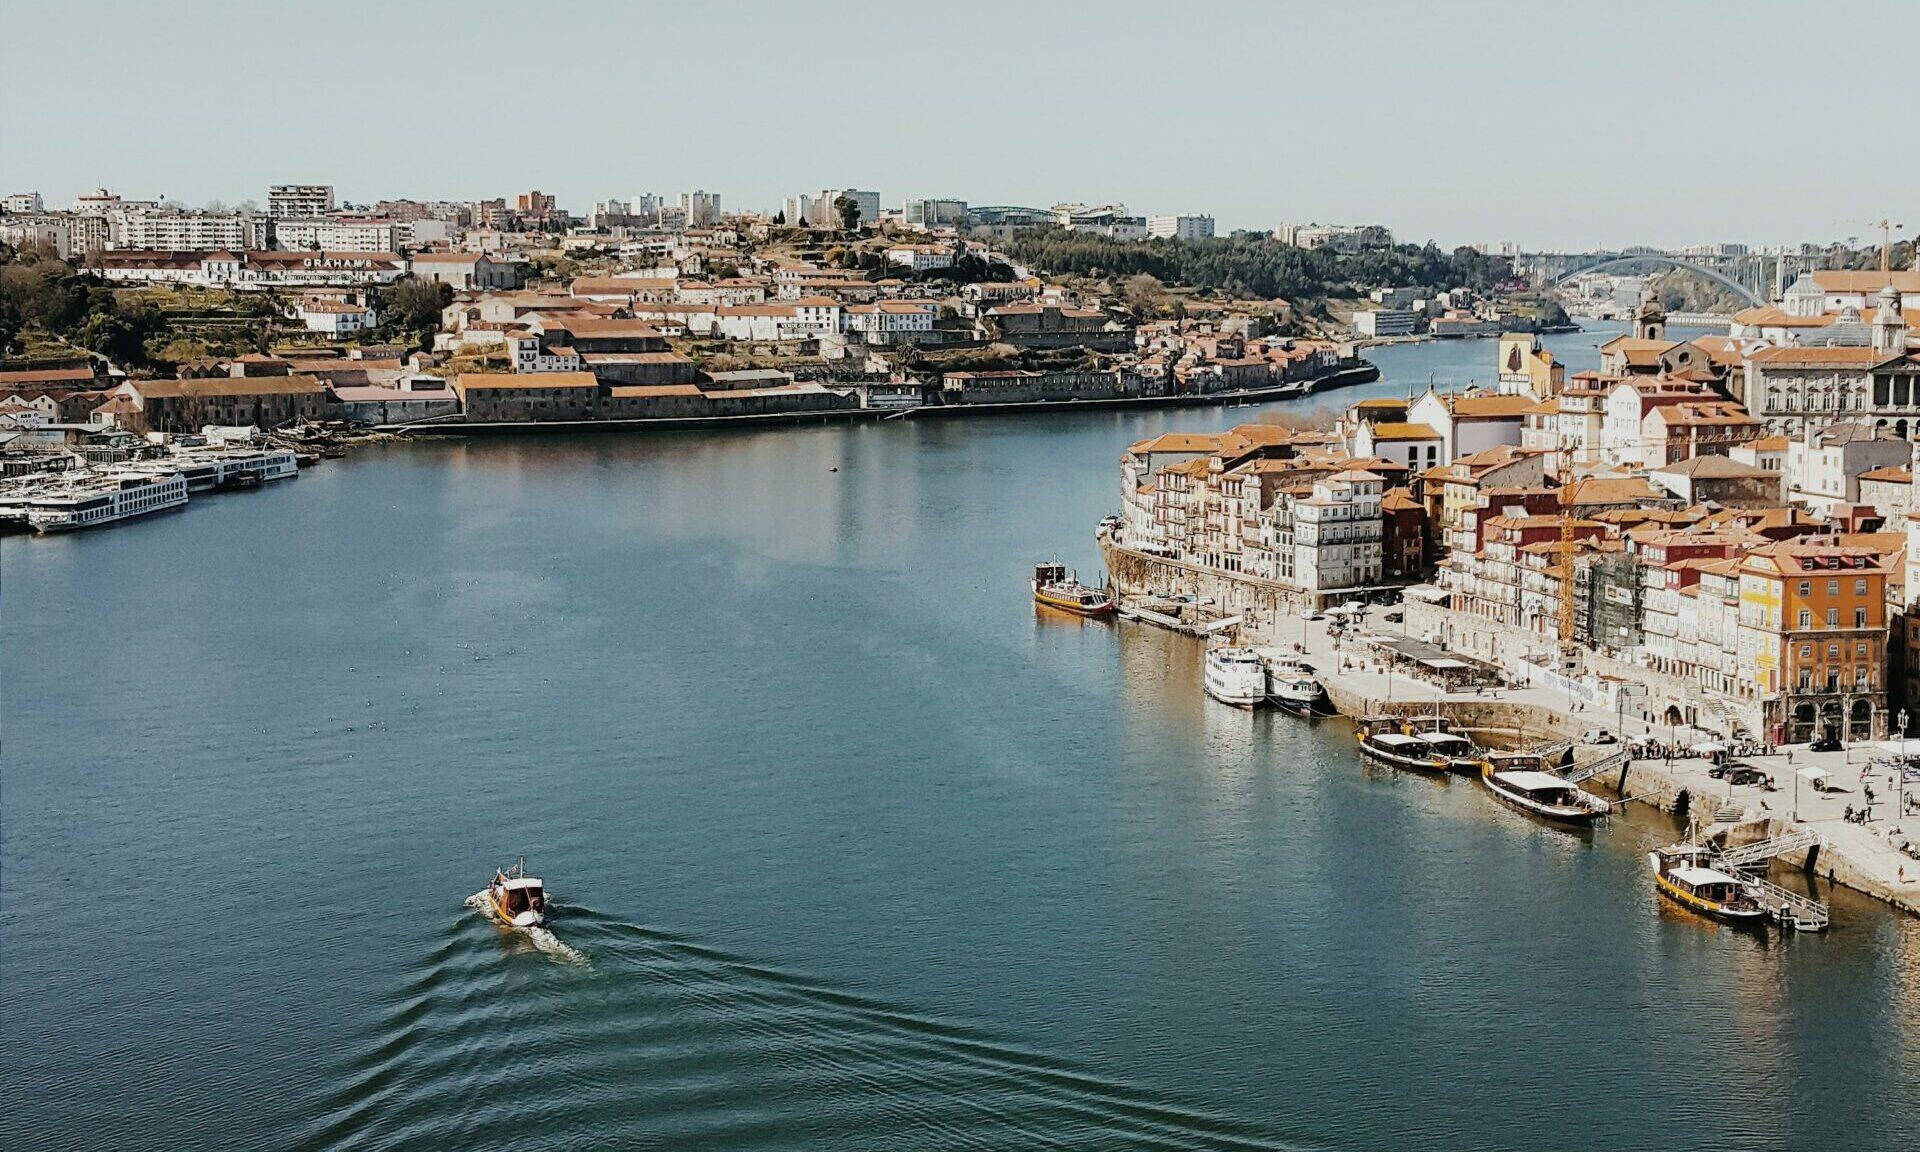 BundleUp – Energy transition in the Portuguese public sector